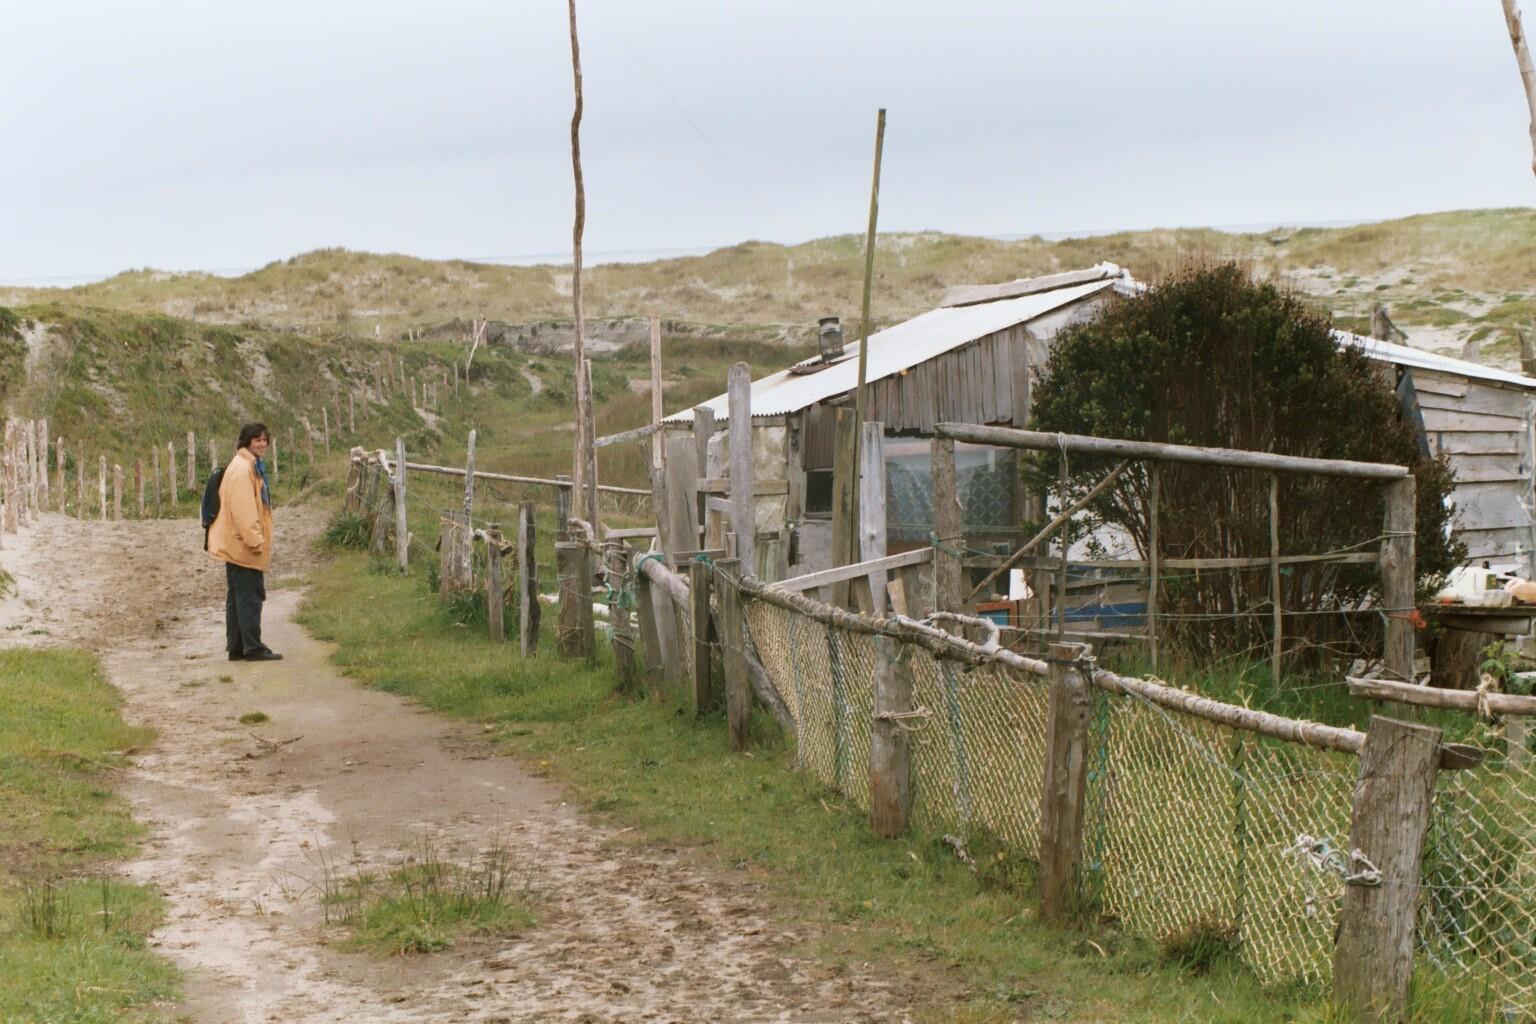 Lonely beach shack